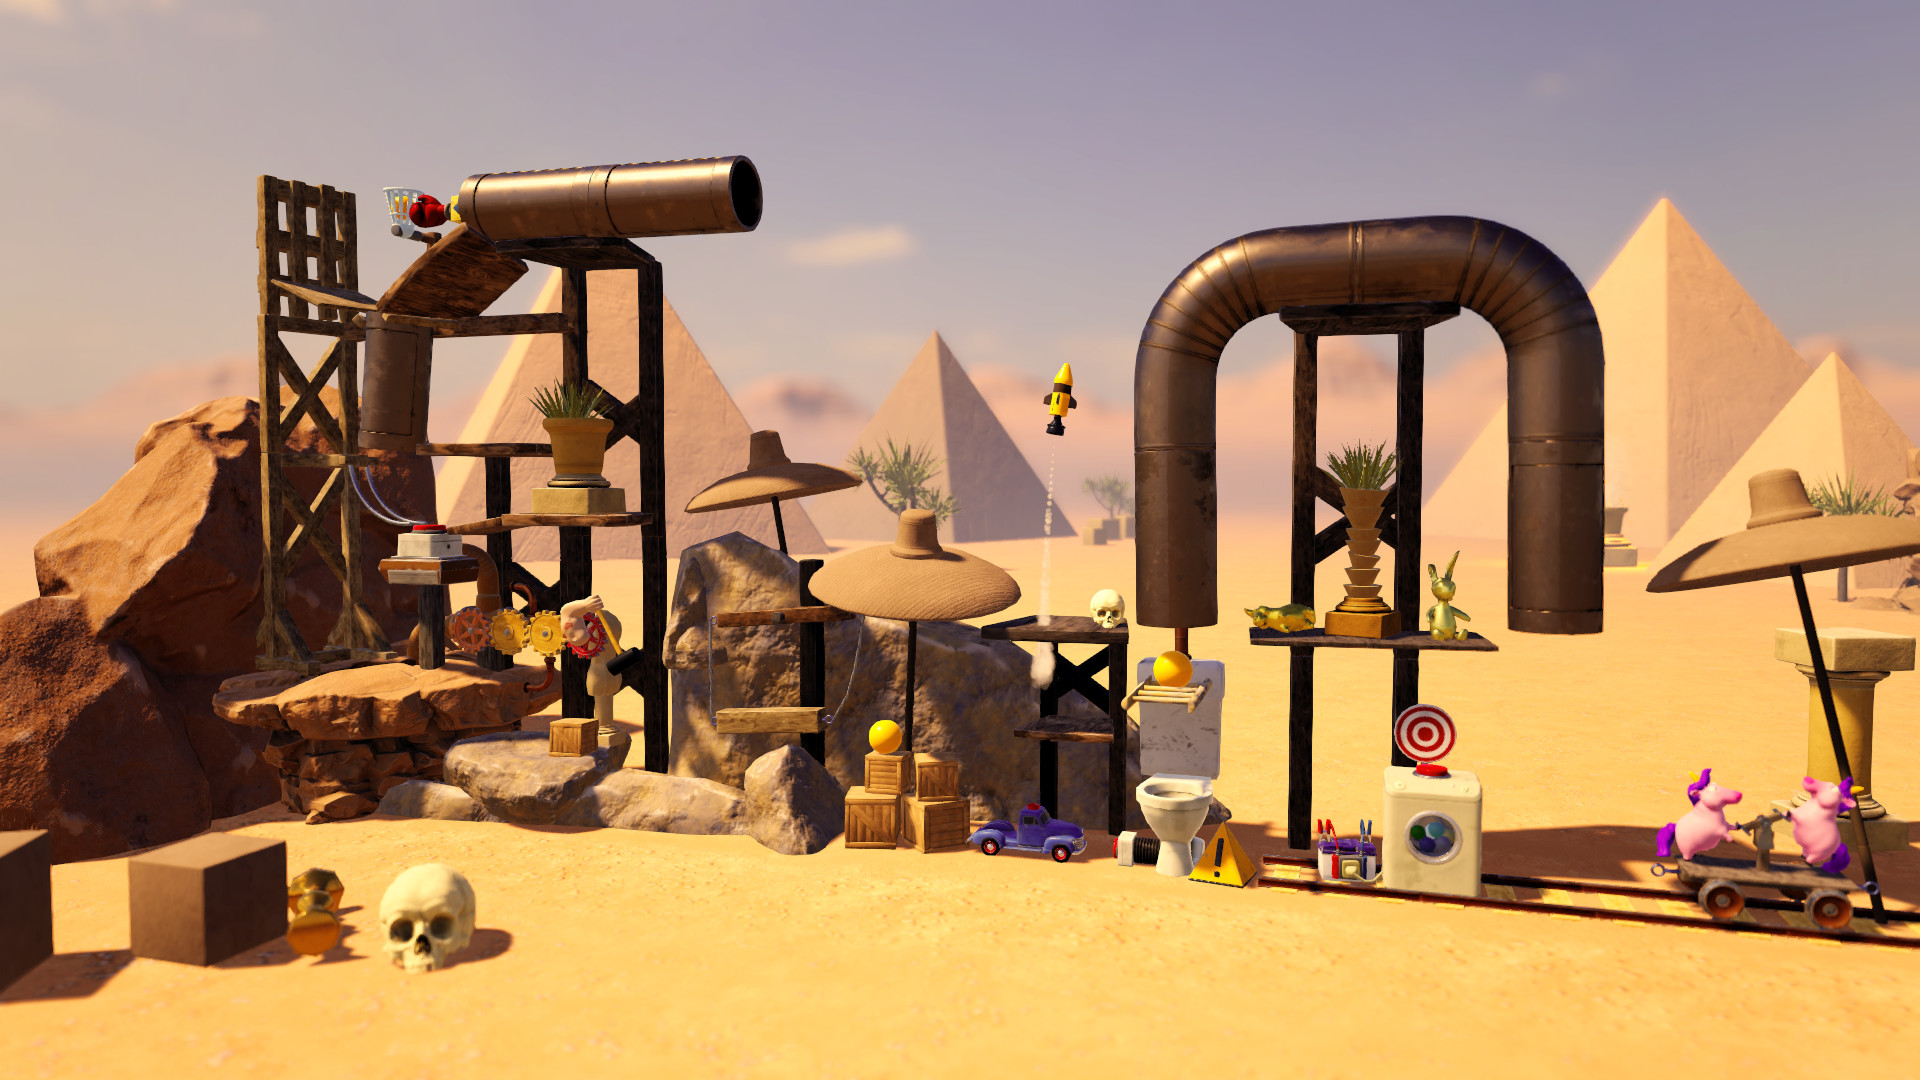 Crazy Machines 3 screenshot